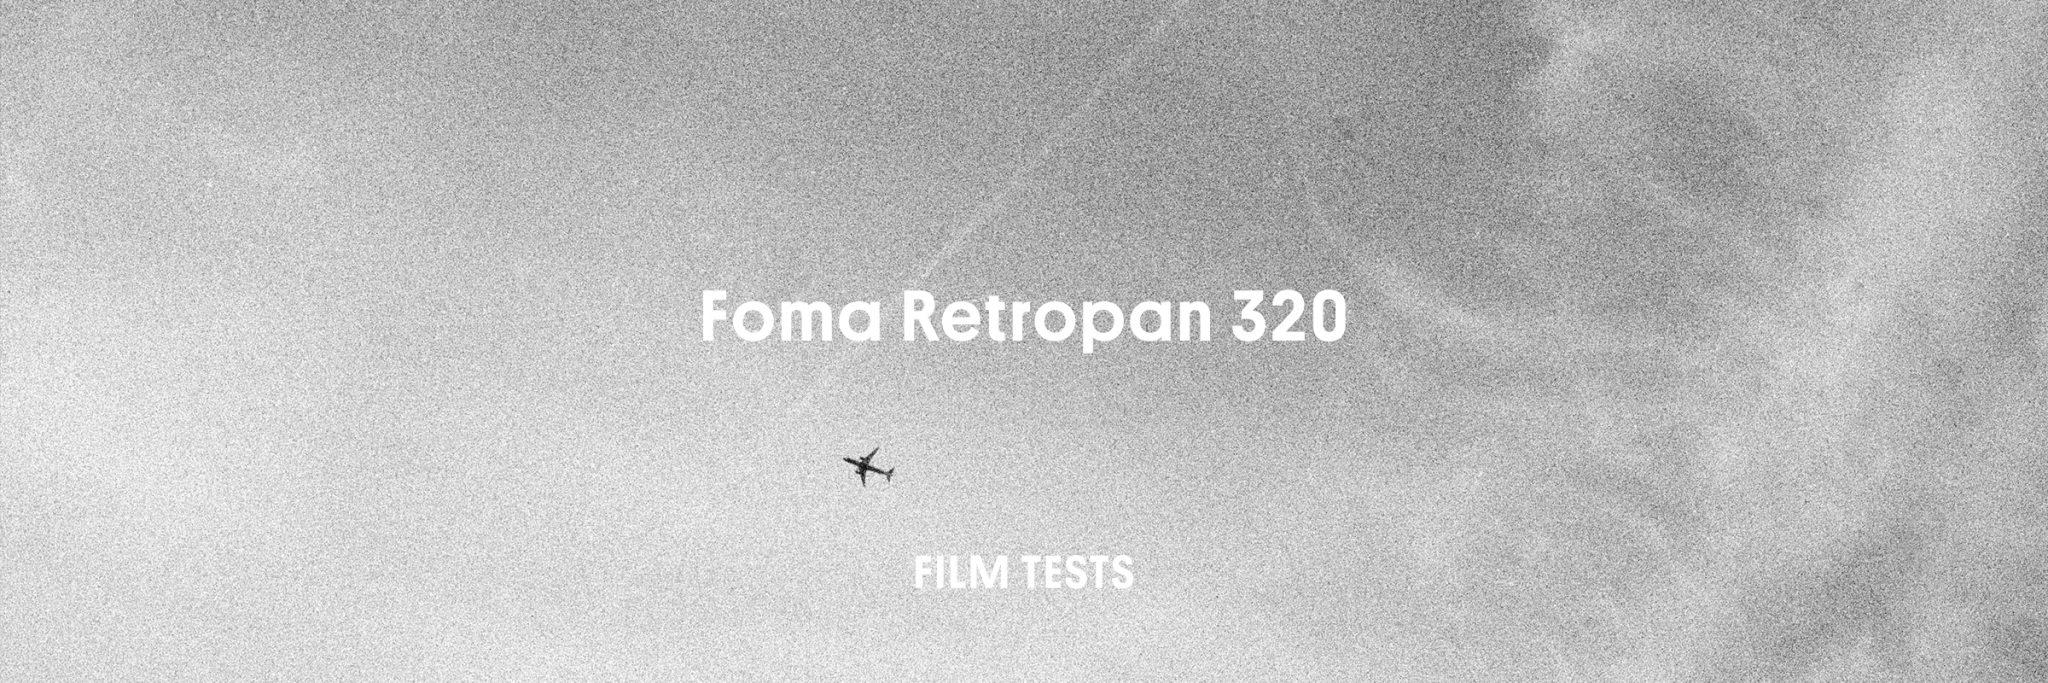 Foma-Retropan-320